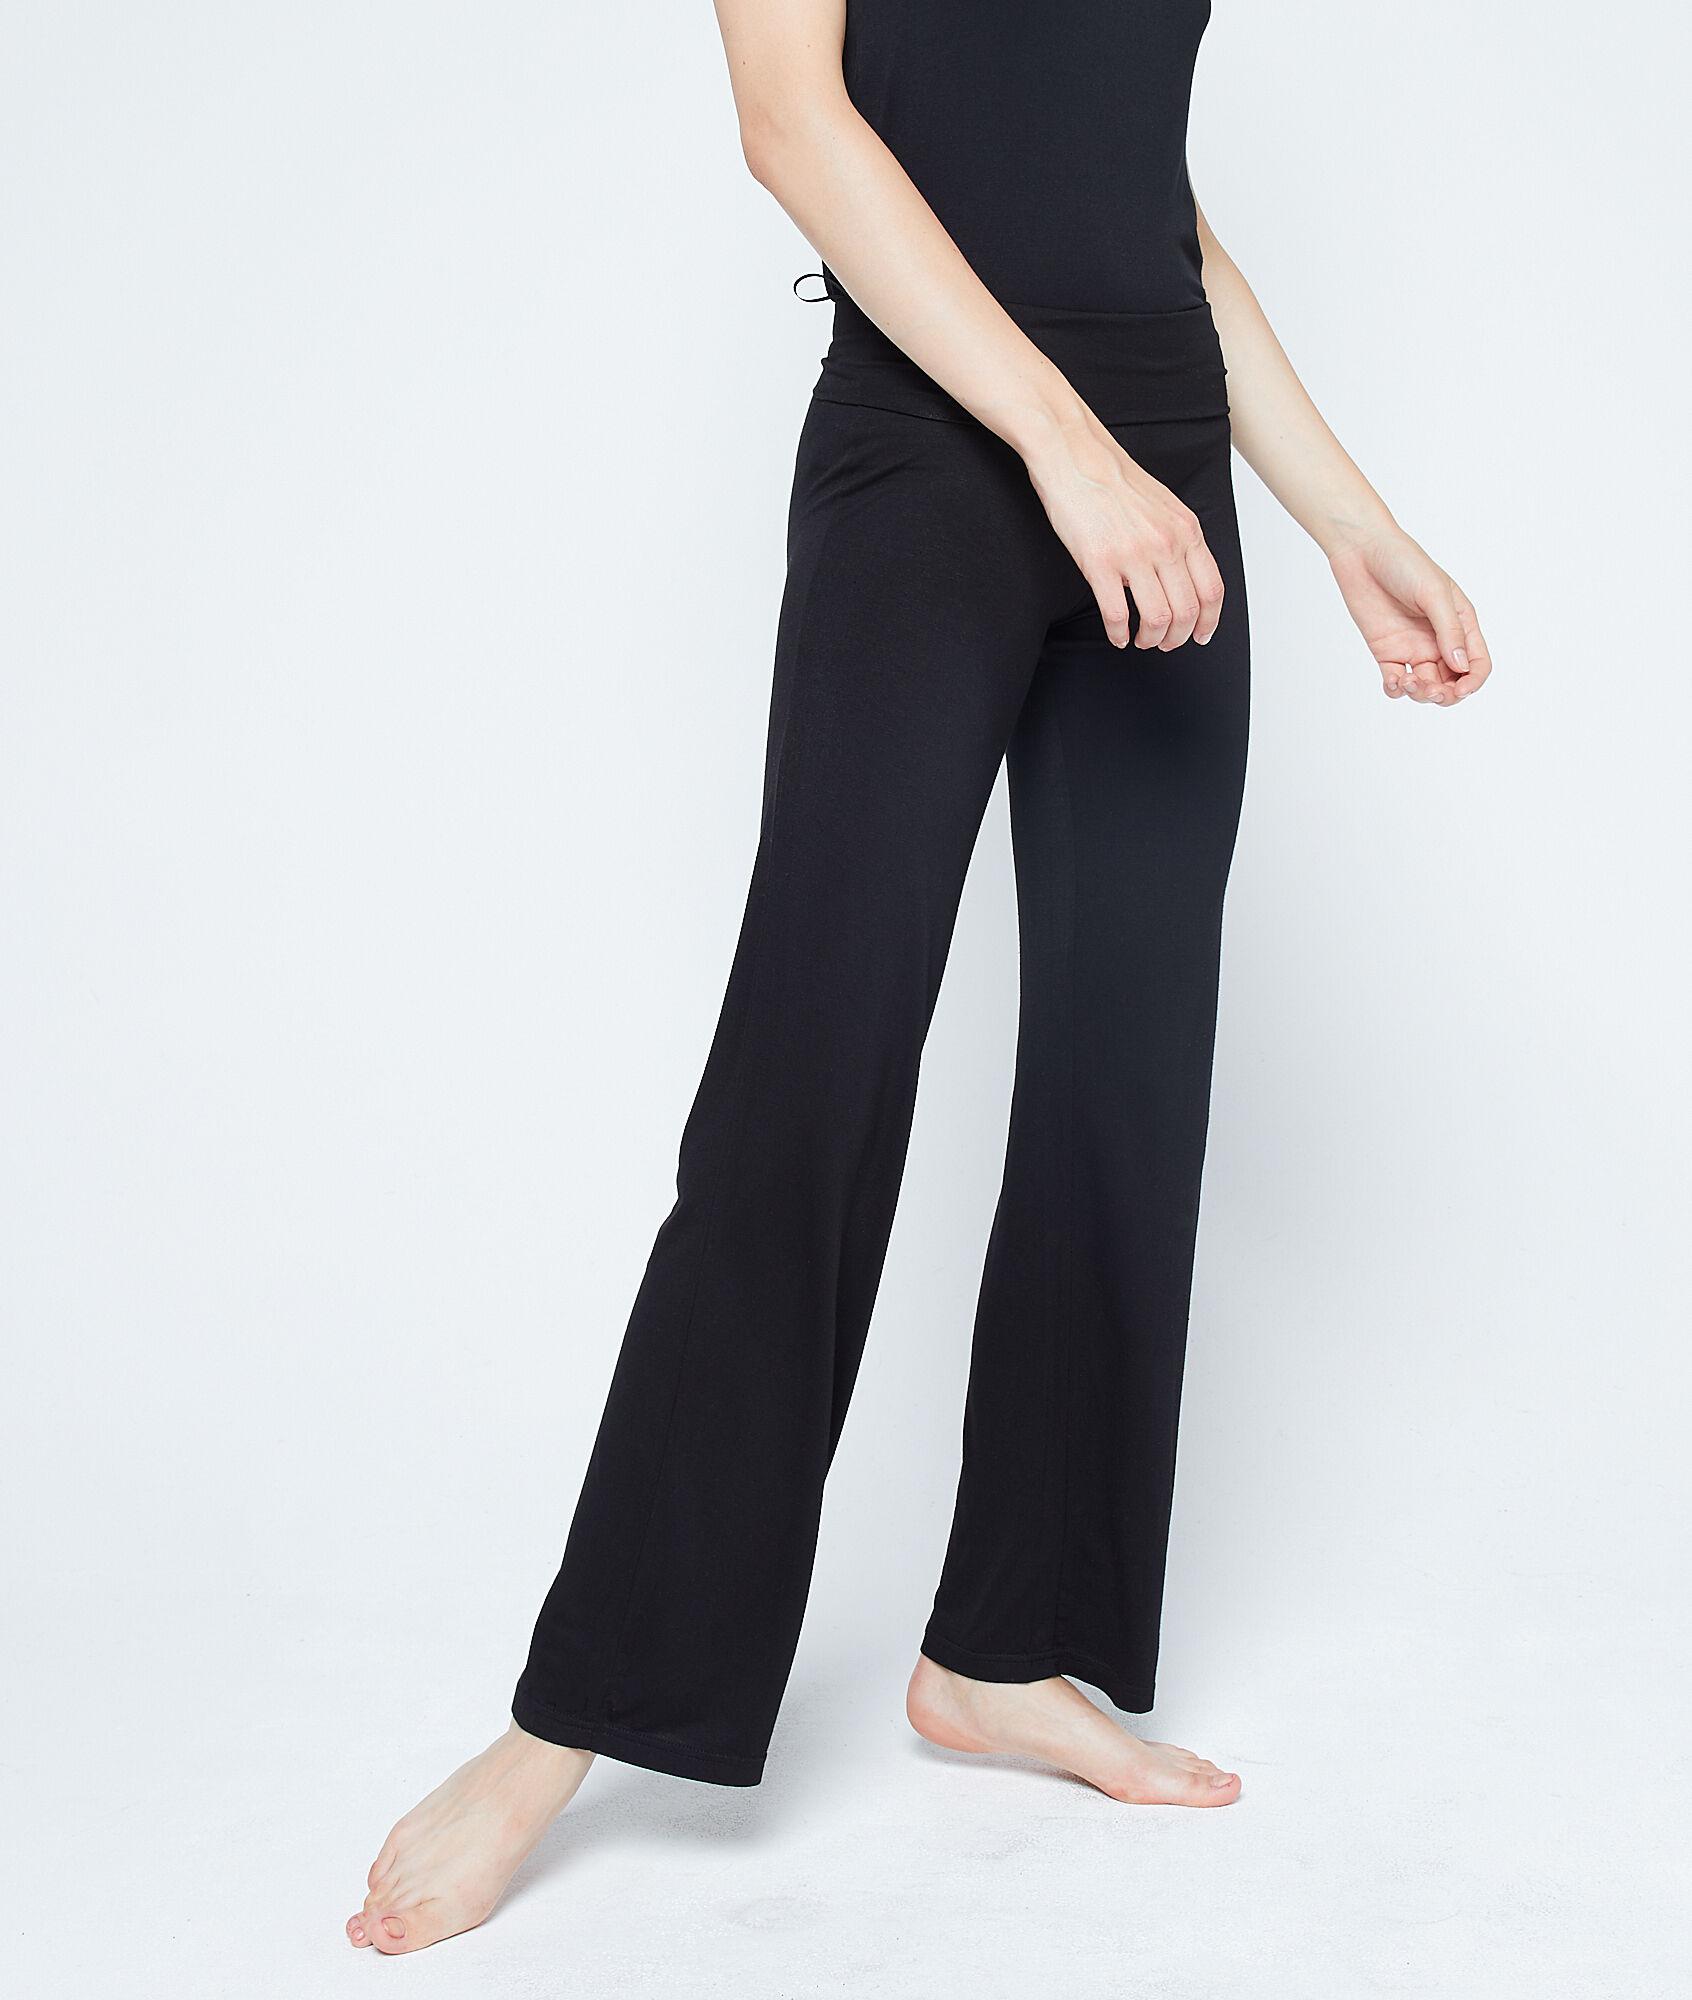 Taille Fluide Etam Haute Amelia Pantalon Noir Y29EHWDI